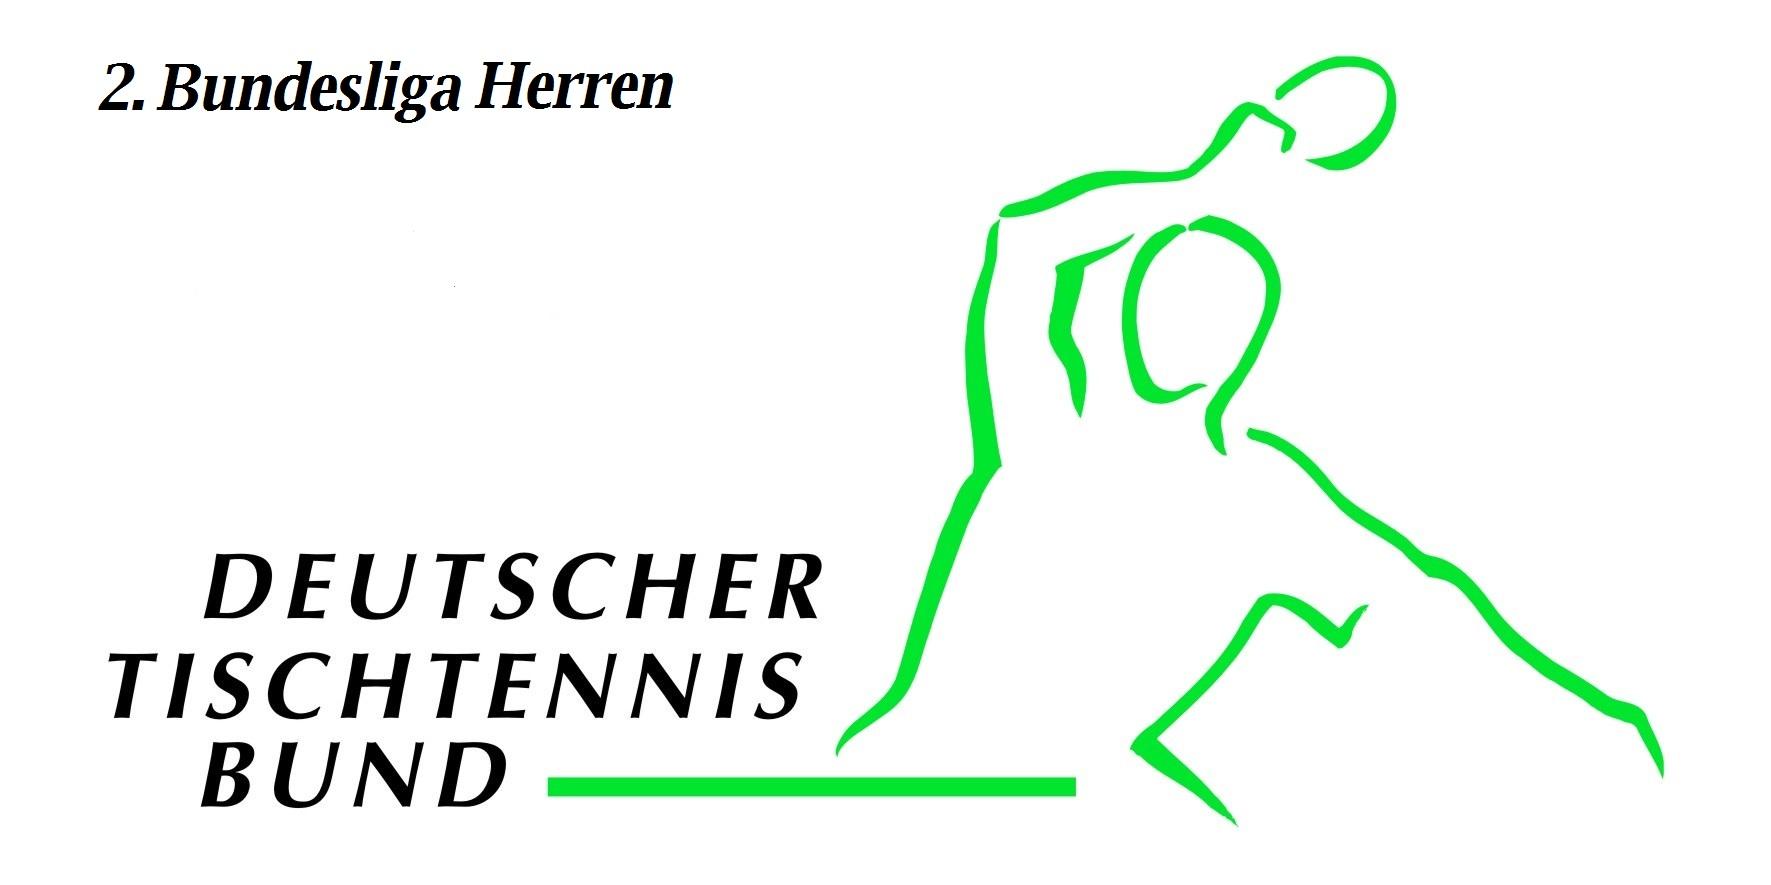 images/artikel/14-15/DTTB 2. Bundesliga Herren.jpg